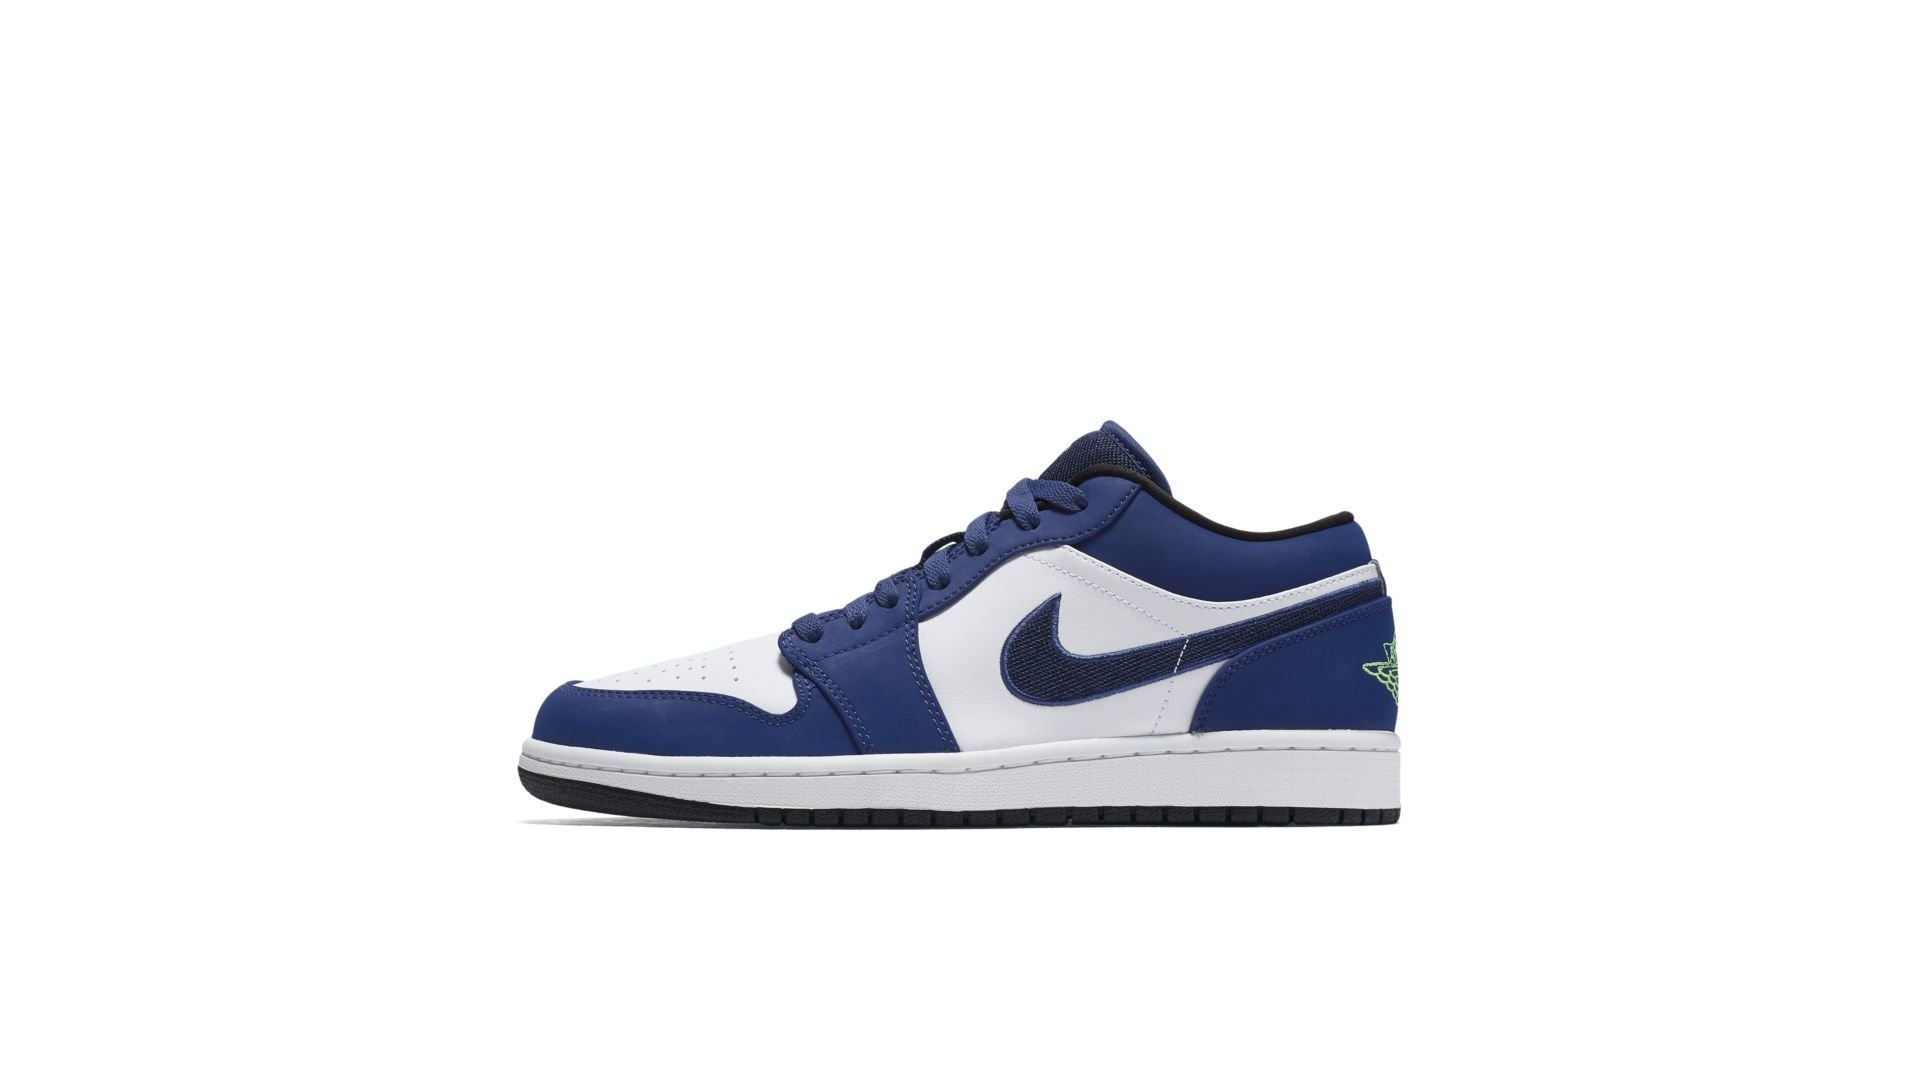 Jordan 1 Low Insignia Blue (553558-405)